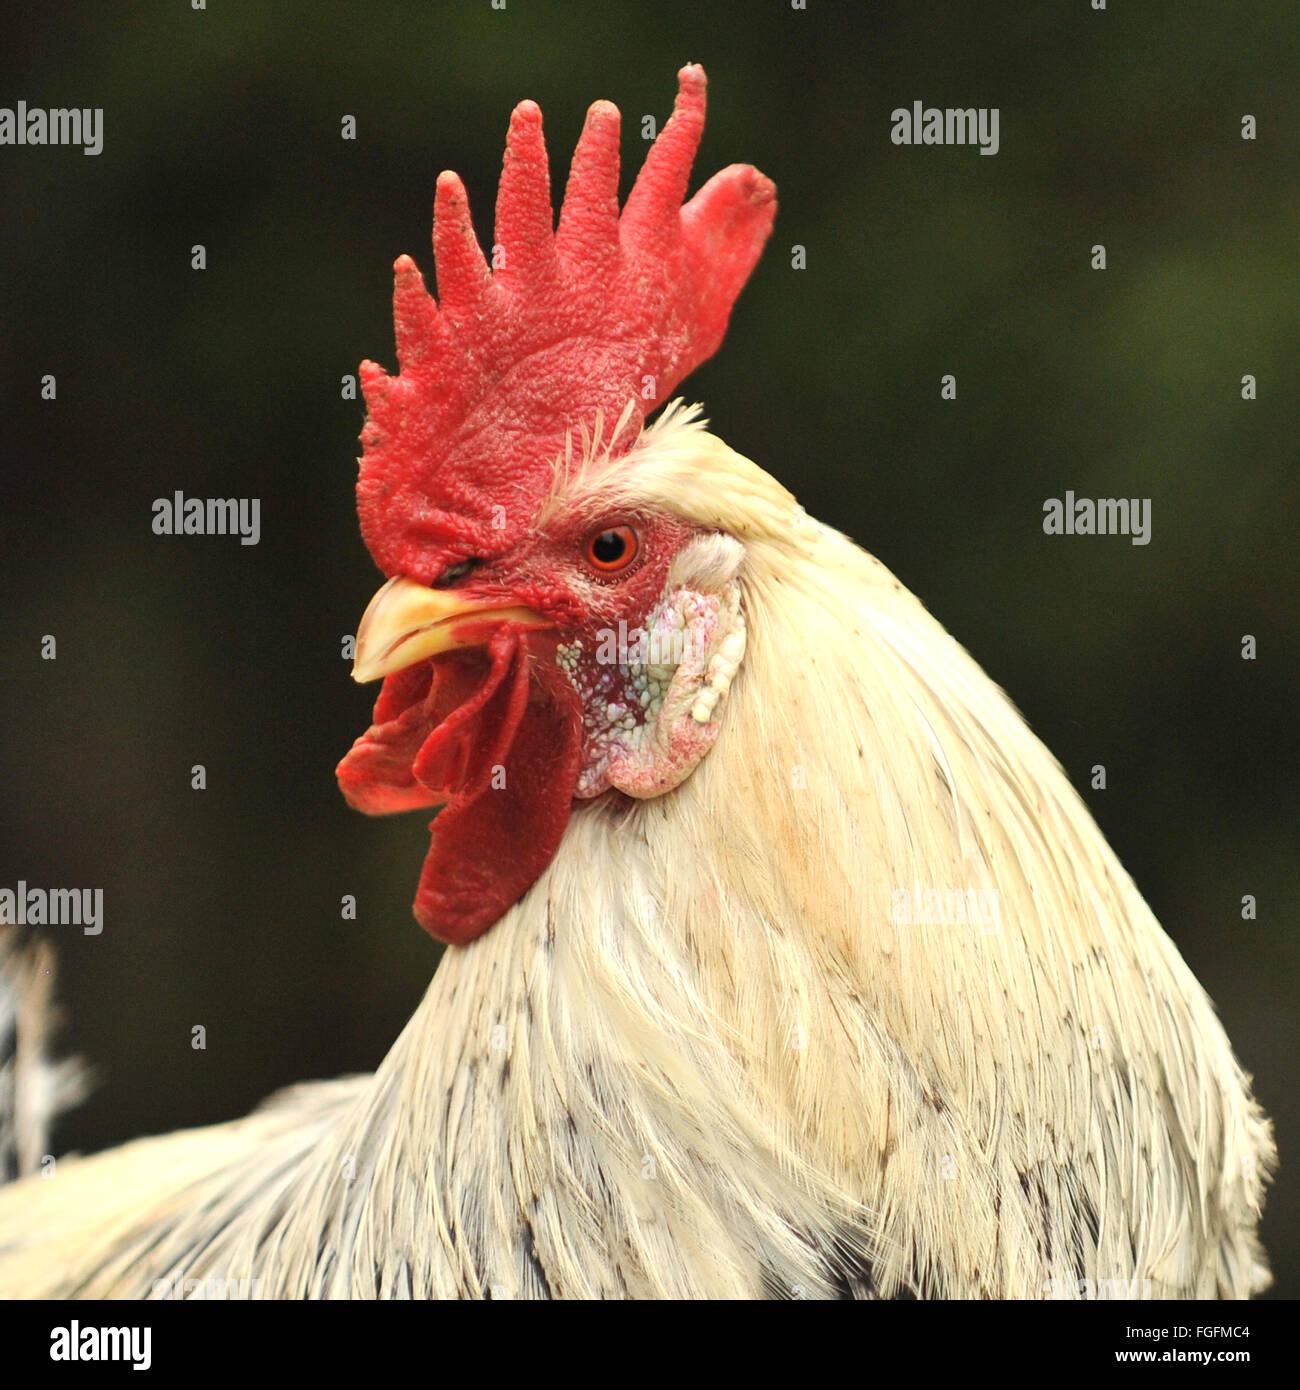 bantam cockerel rooster - Stock Image